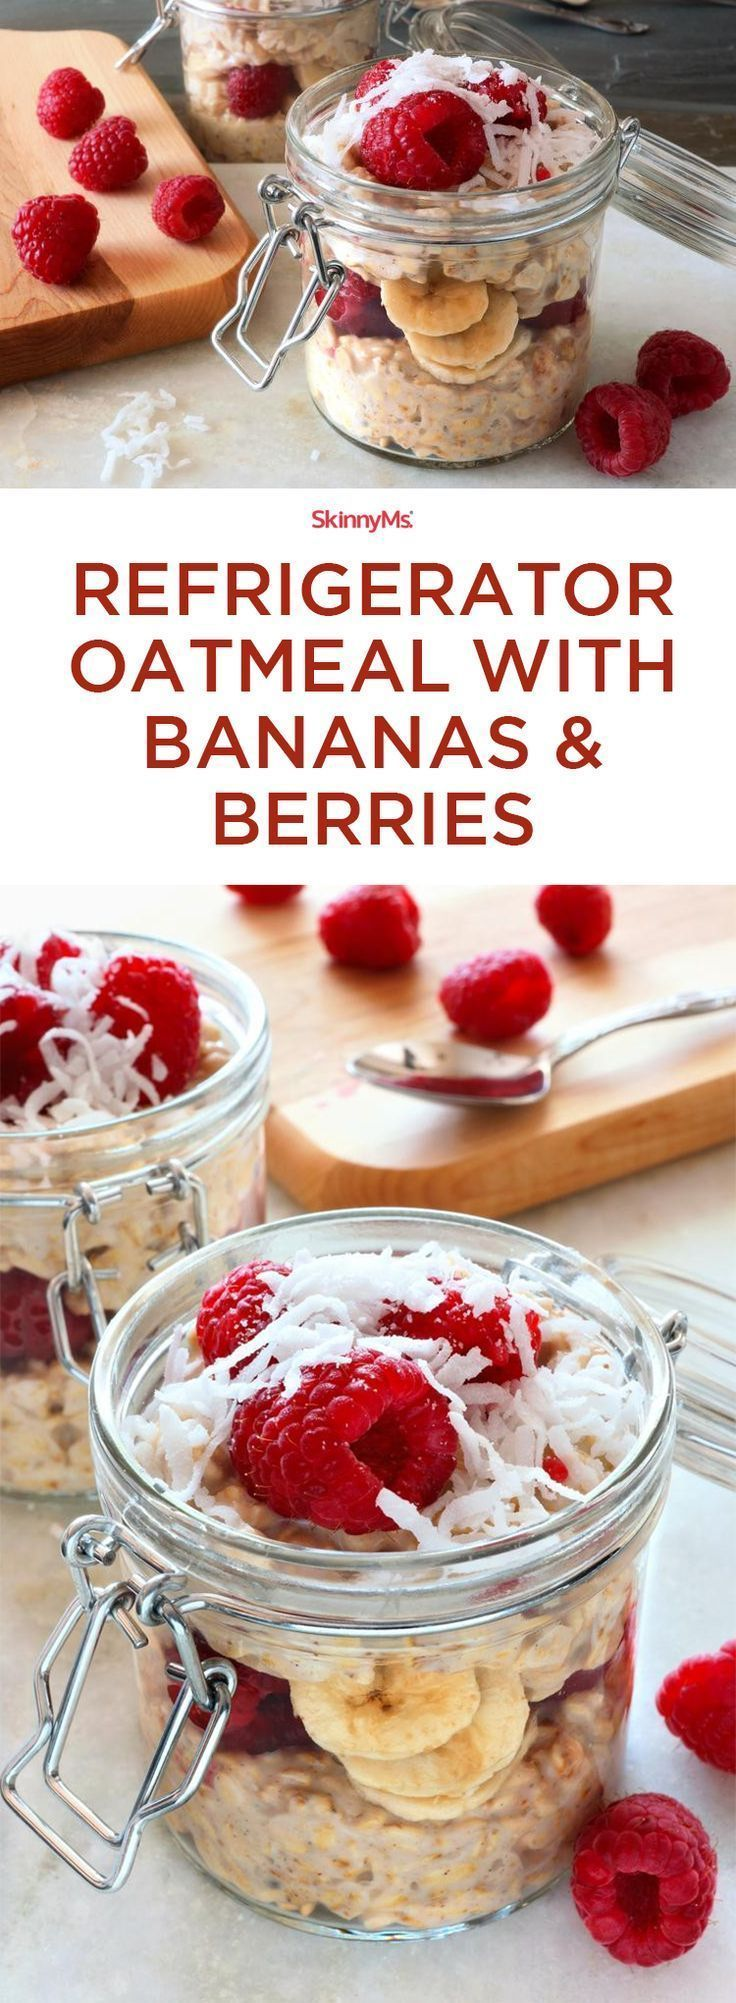 Refrigerator Oatmeal with Bananas & Berries! Soooo yummy!